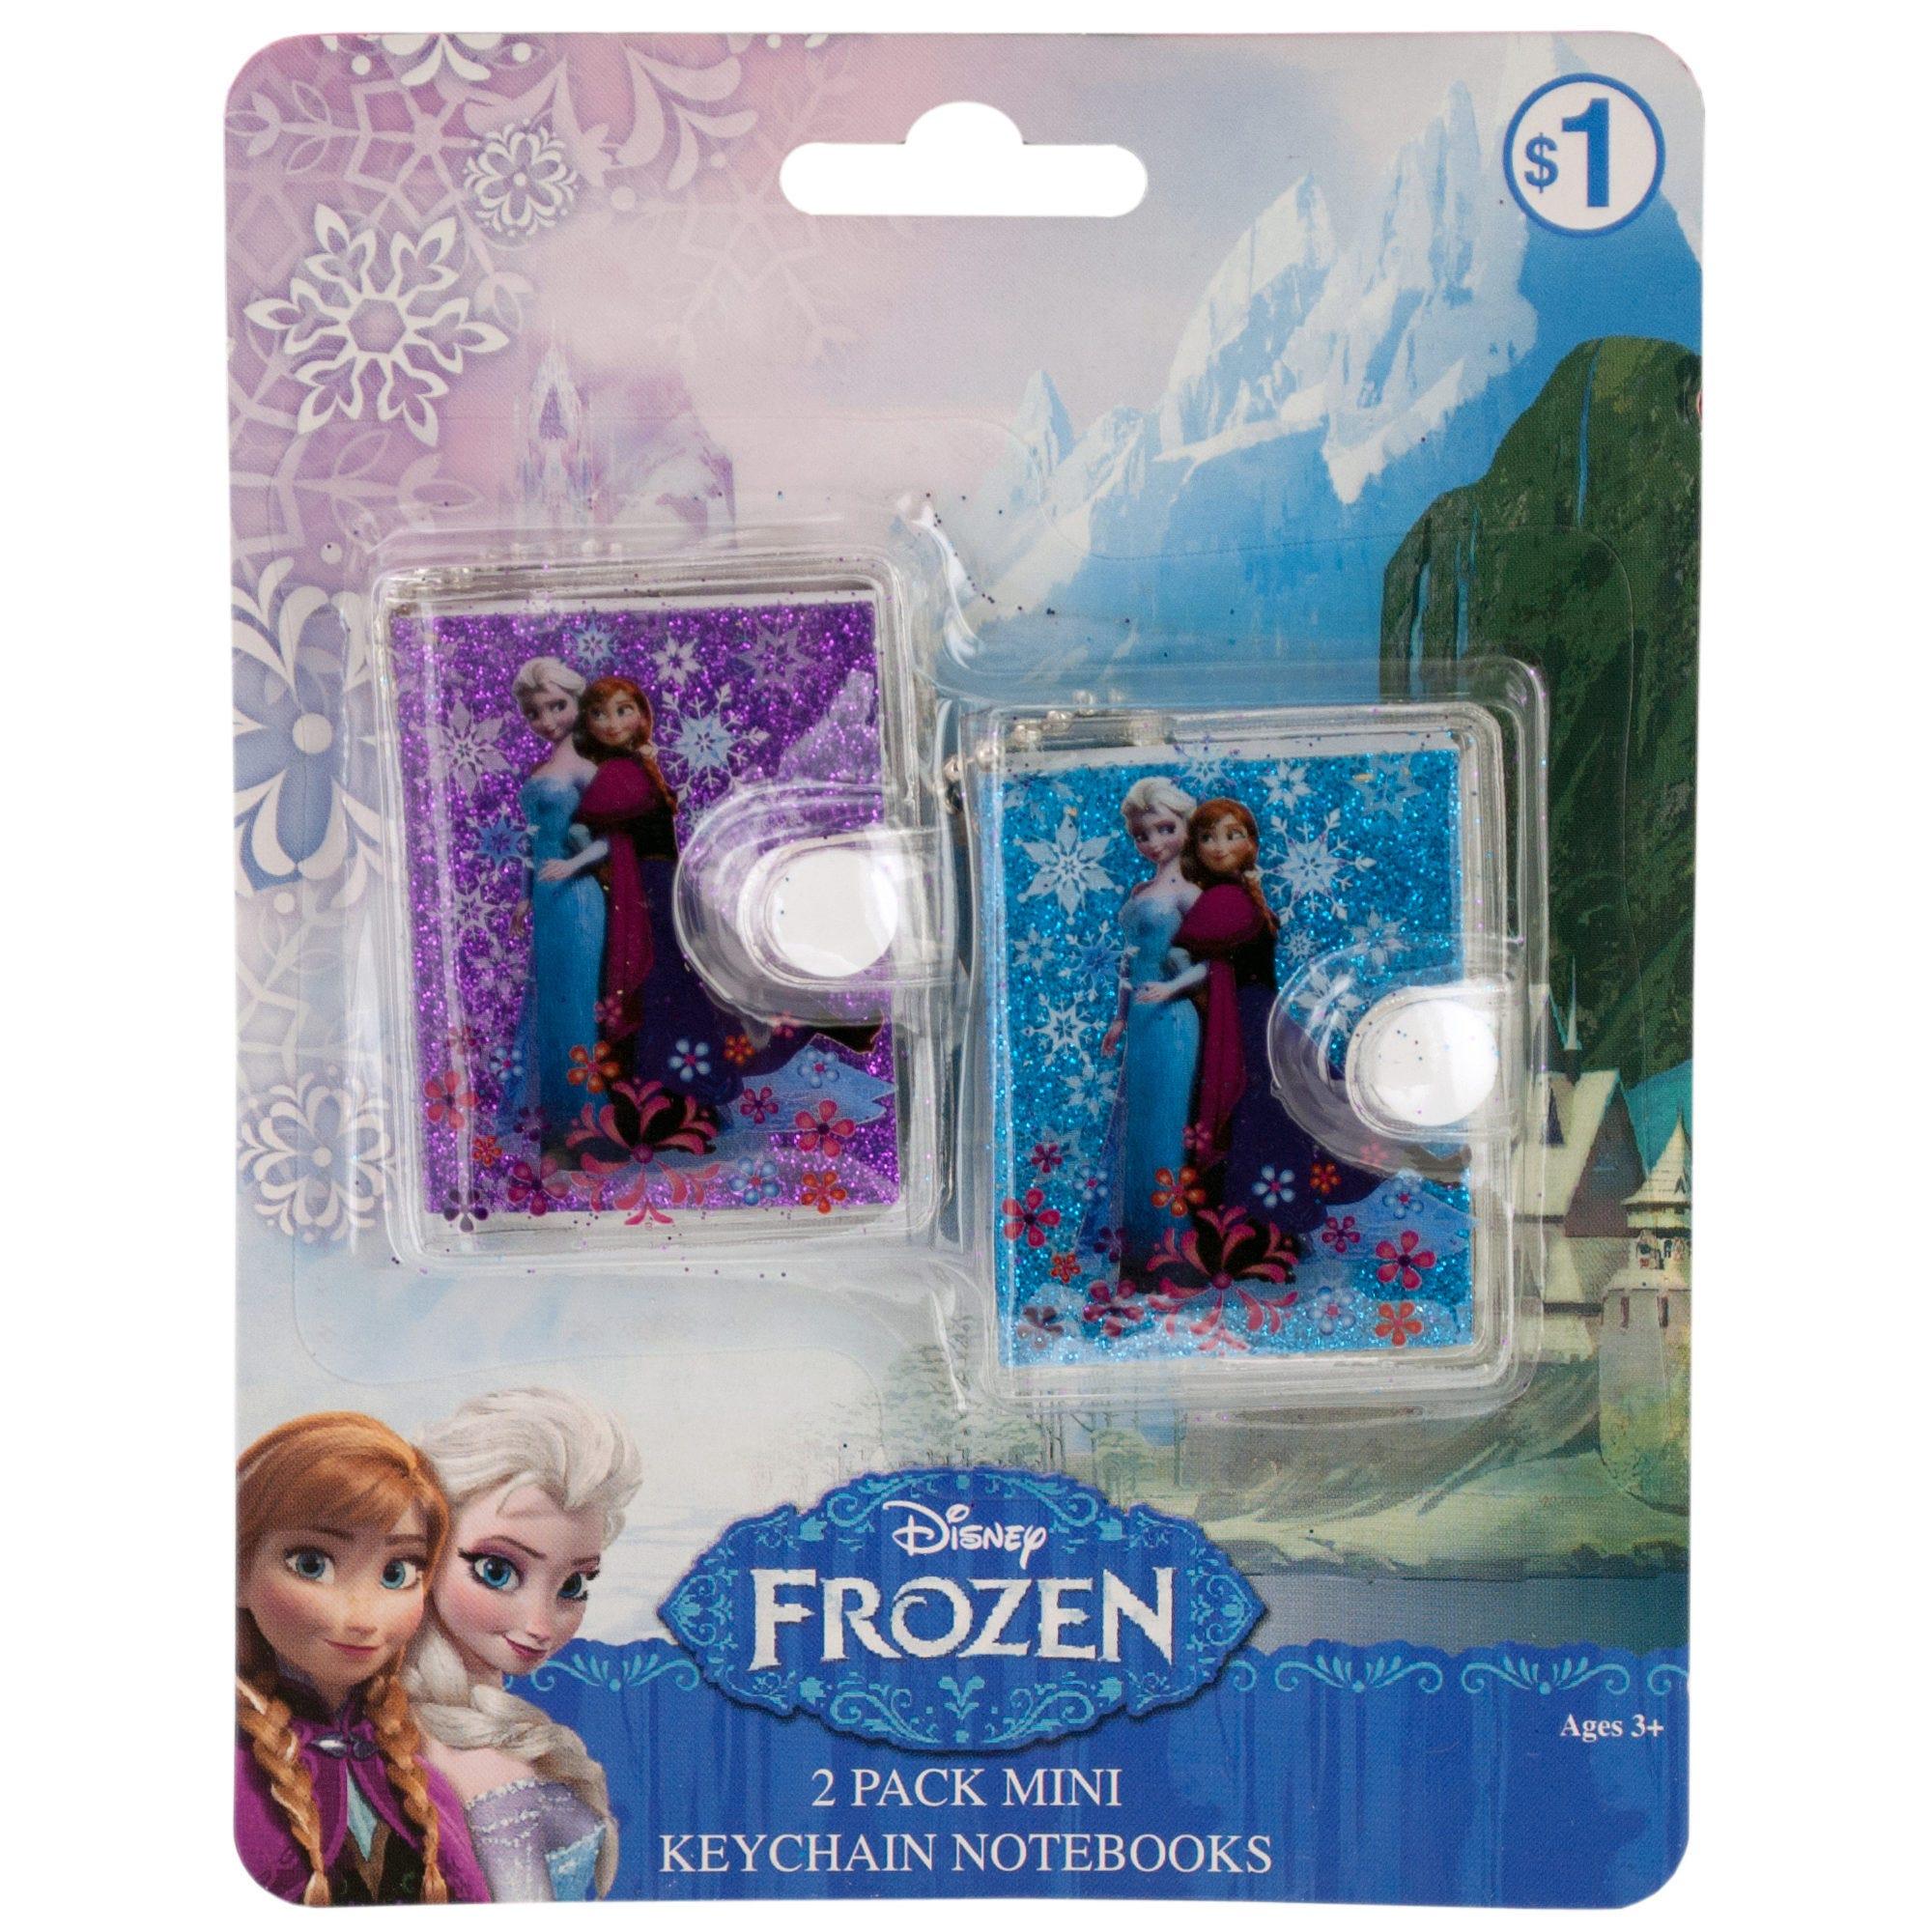 Disney Frozen Mini KEYCHAIN Notebooks Set- Qty 24